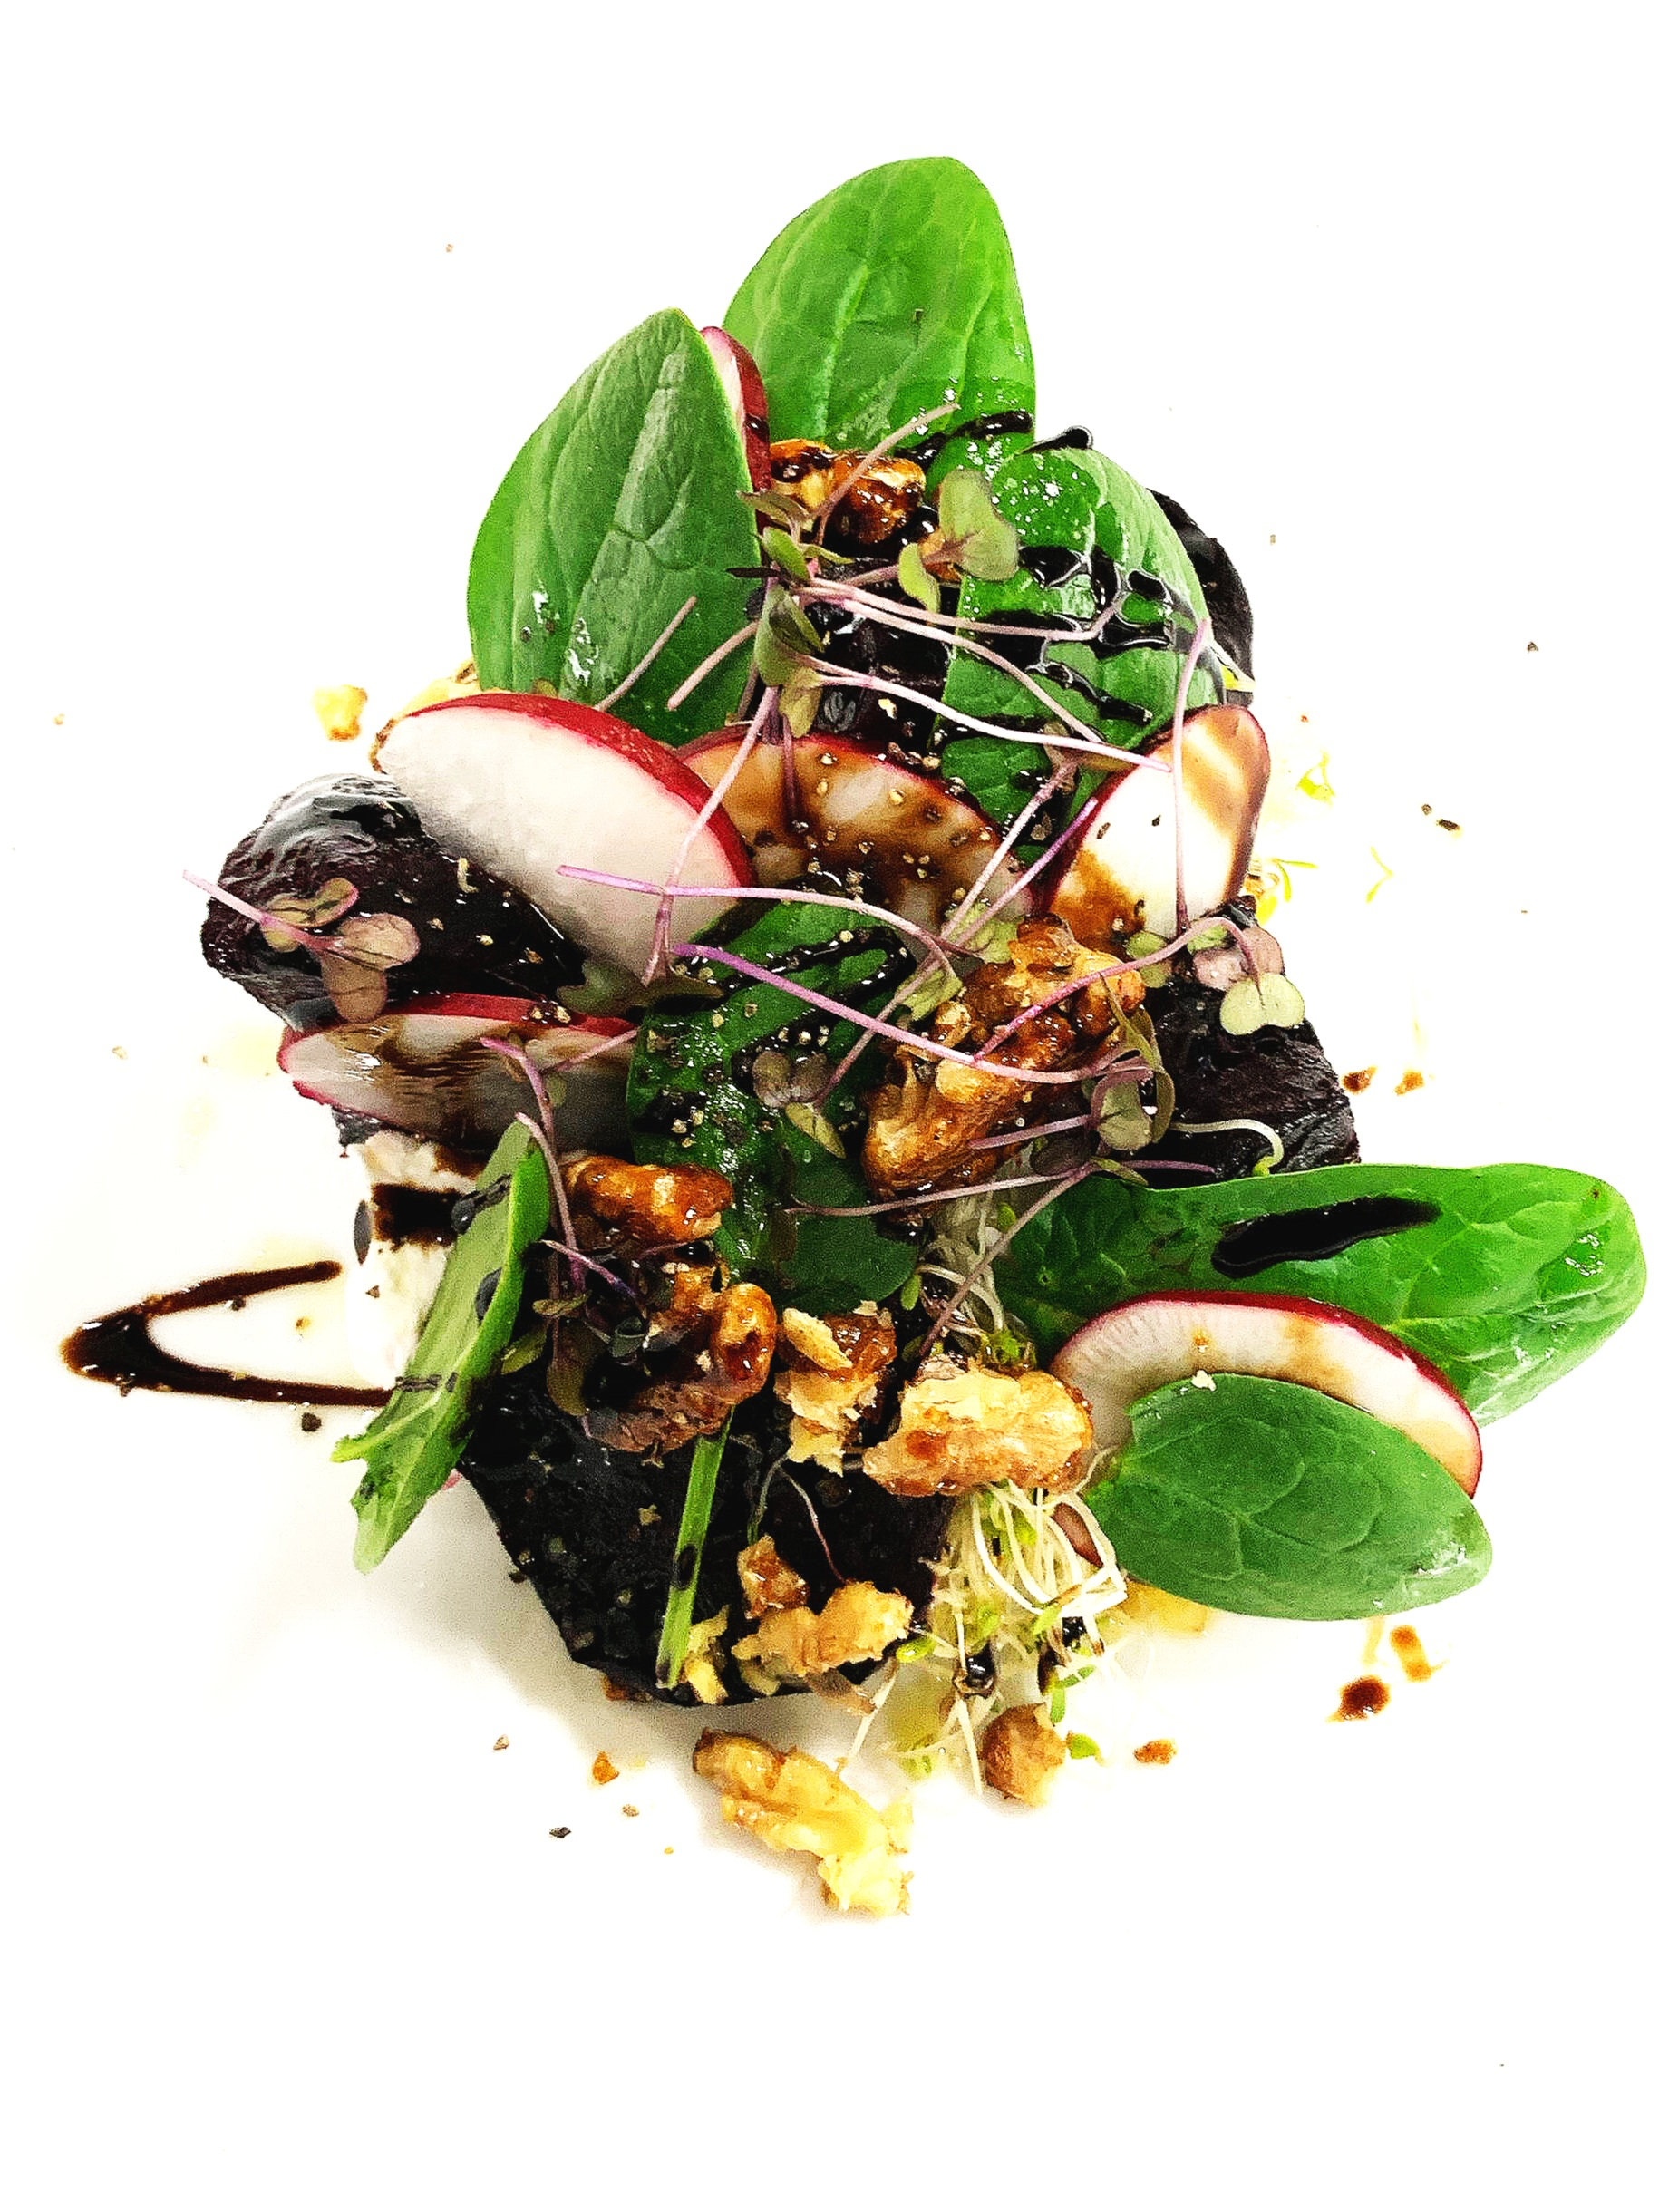 goat salad image1.jpg